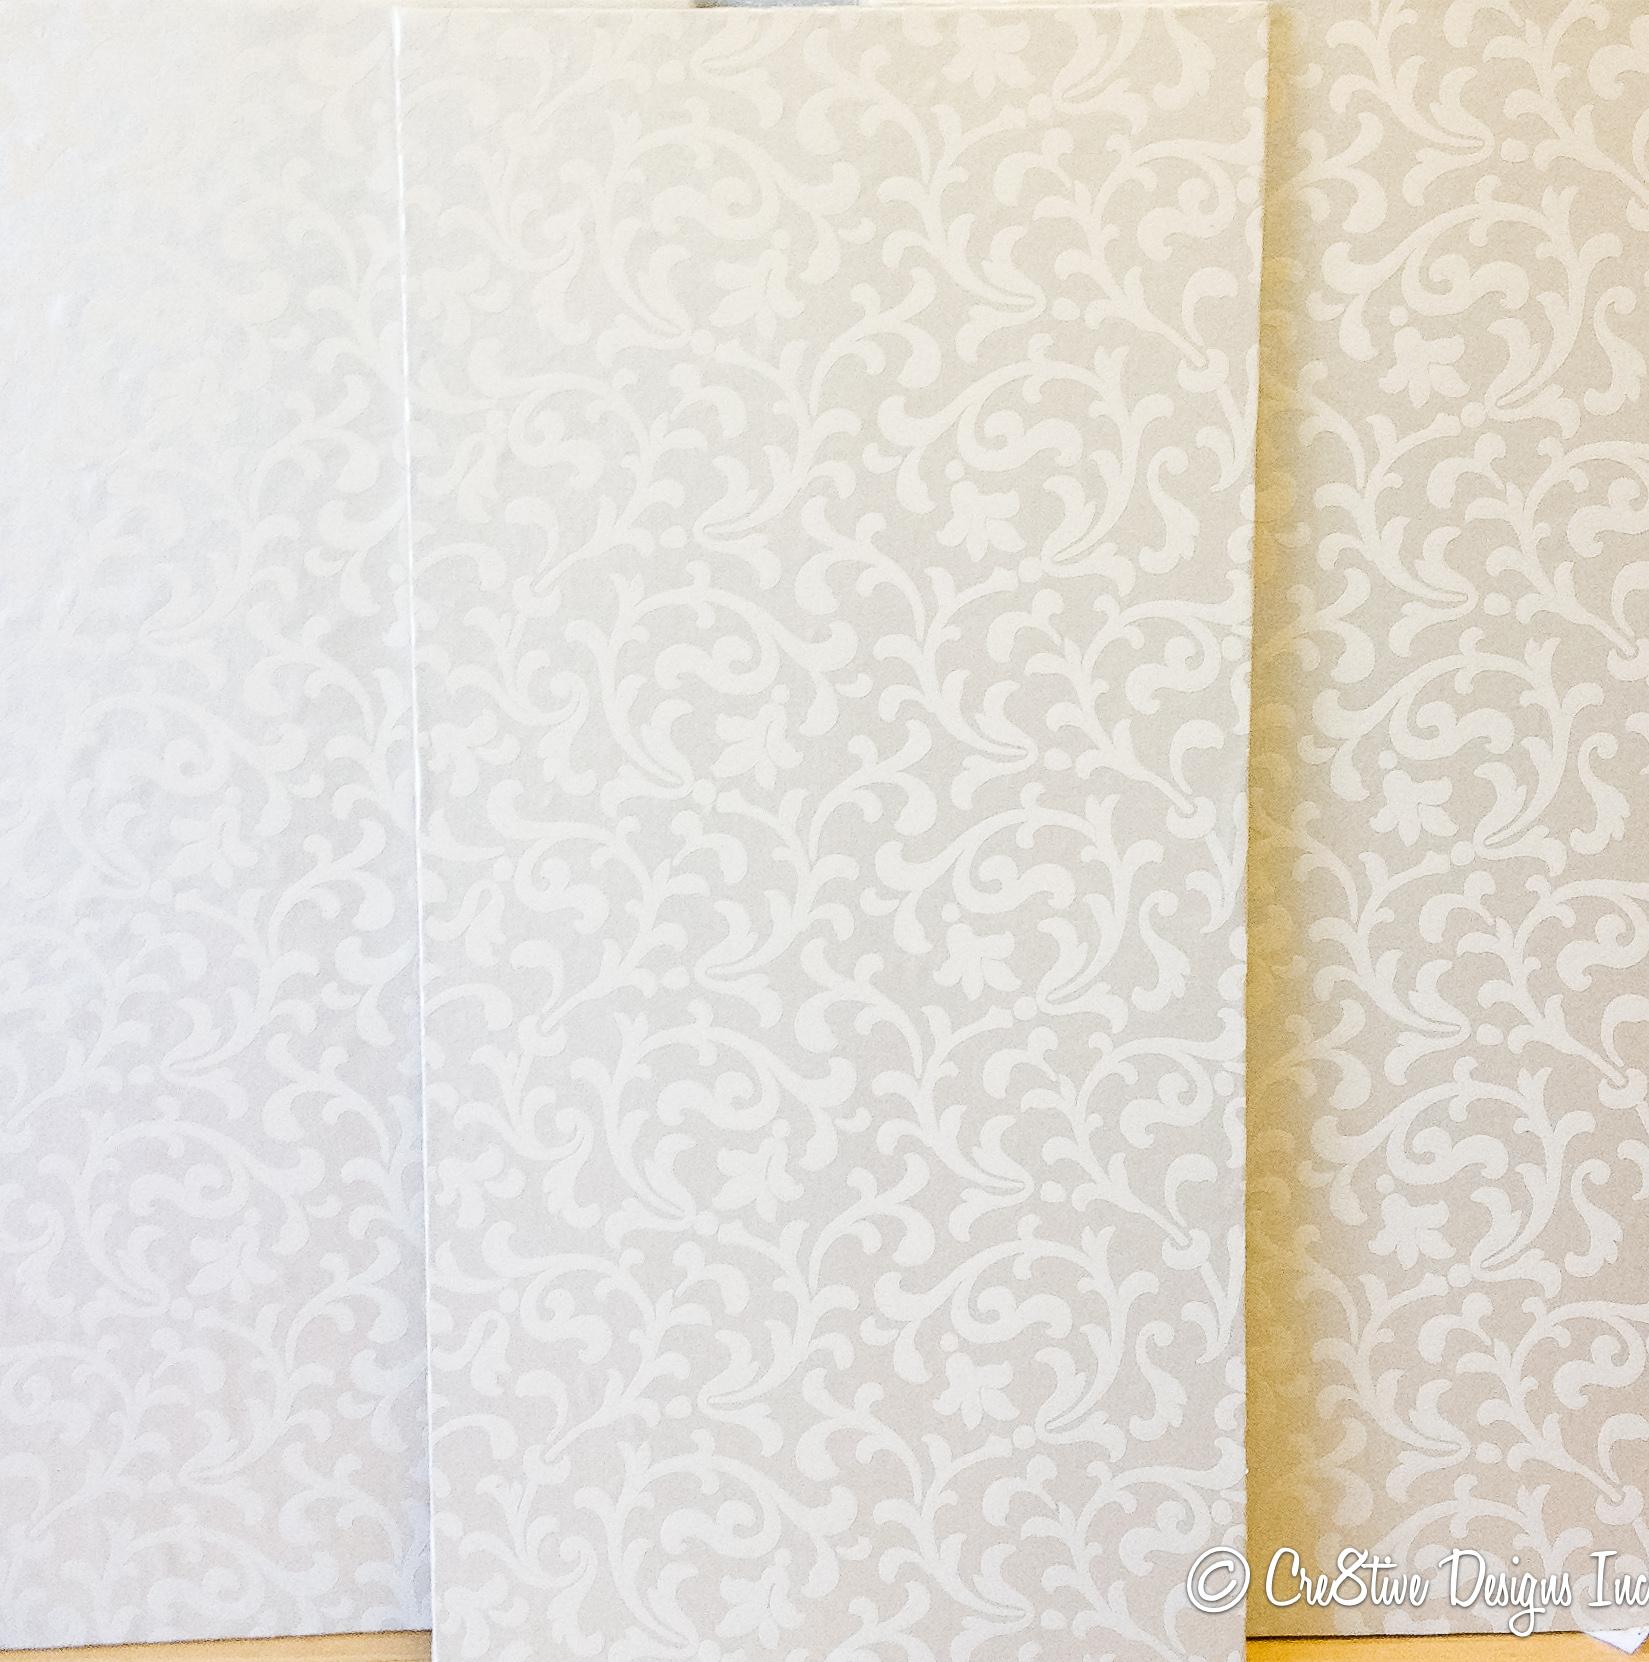 Candice Olson Wallpaper Loopelecom 1649x1662